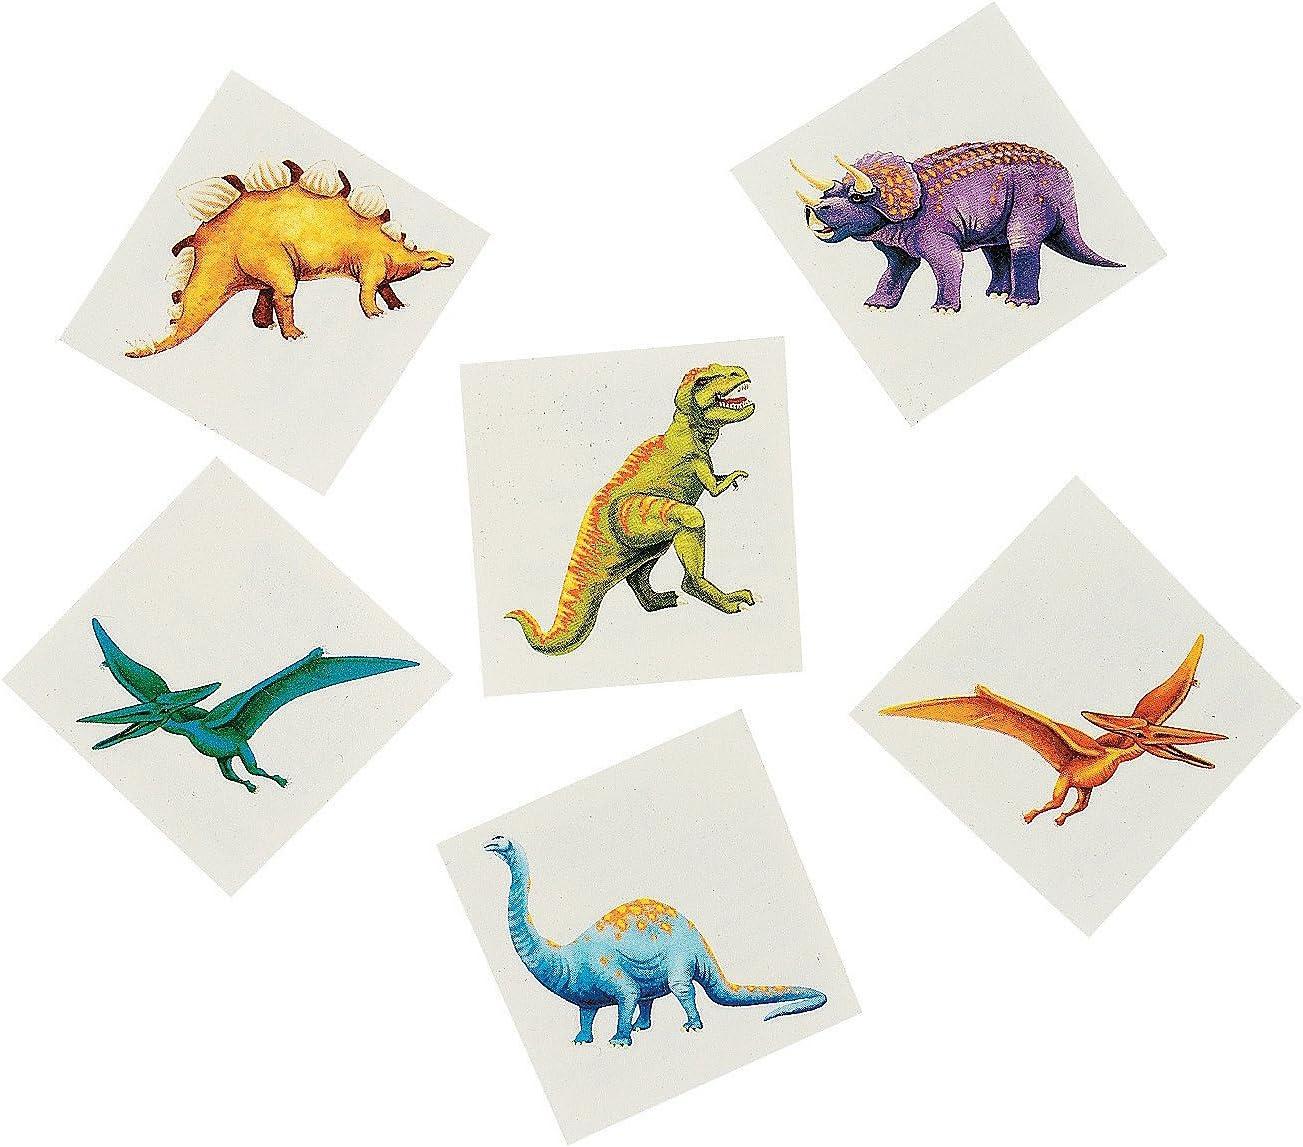 48 childrens temporary,dinosaur tattoos by Hendbrandt